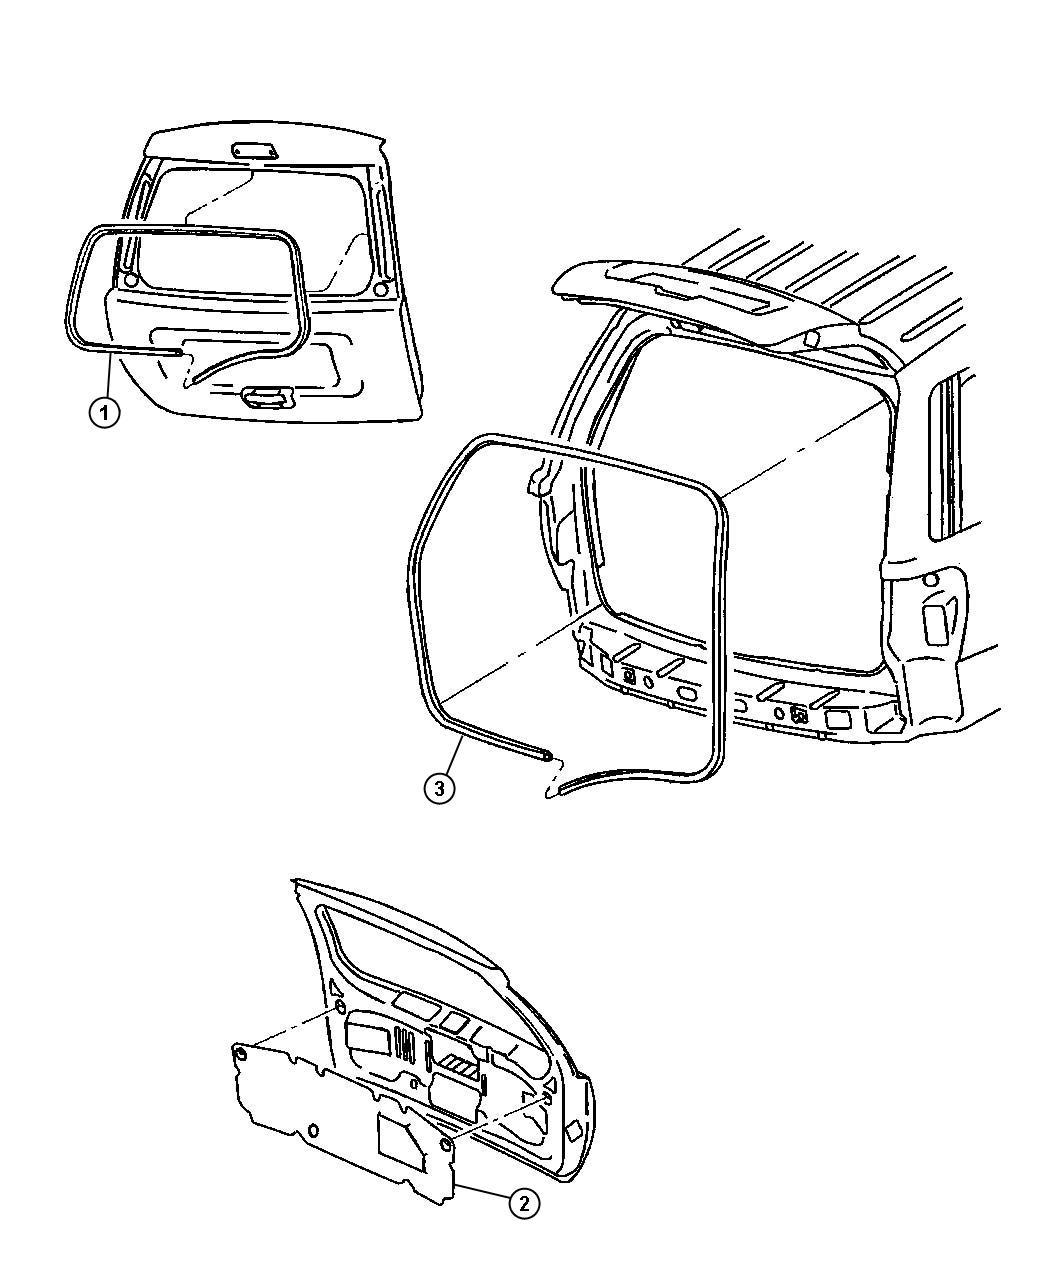 Jeep Wrangler Seal Liftgate